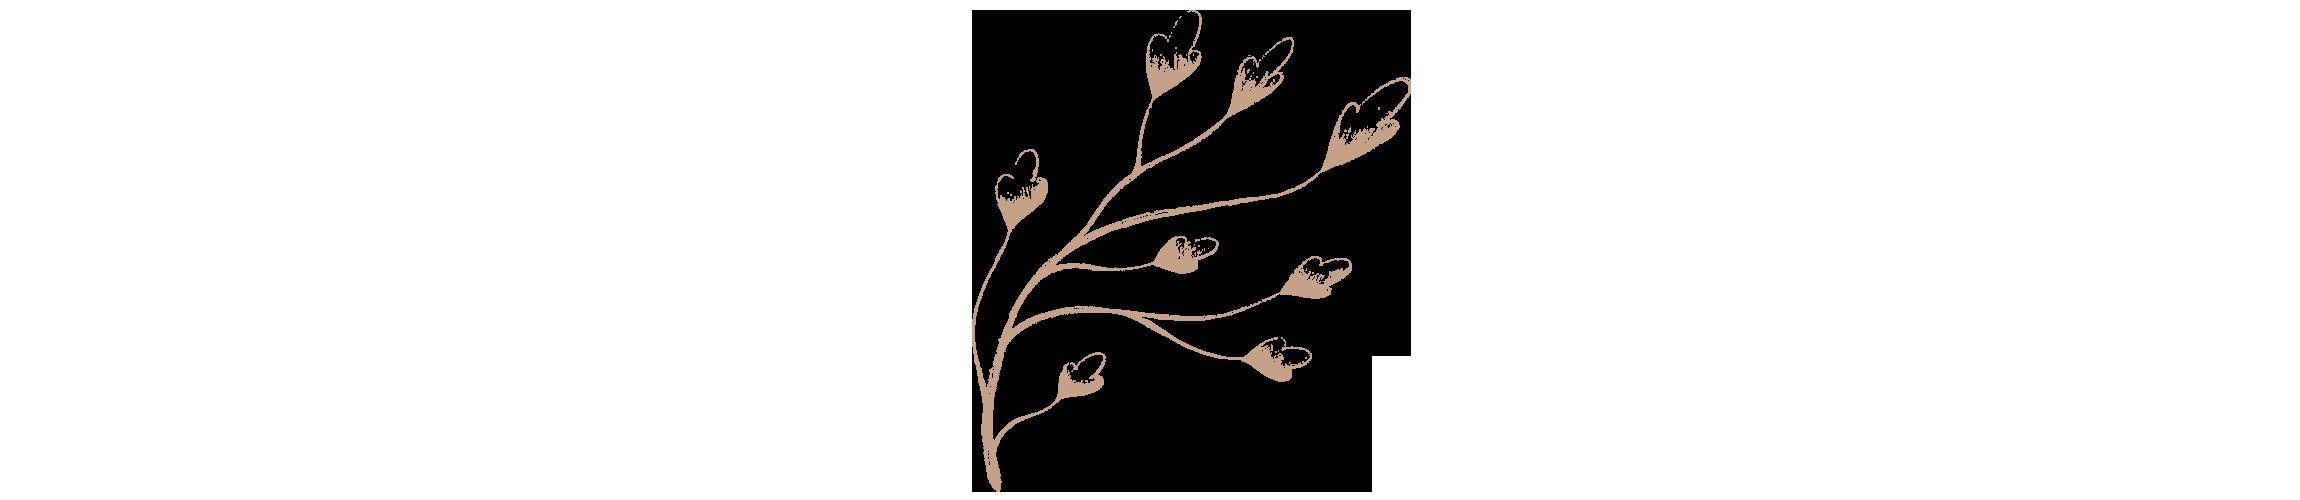 Leesa Dykstra Designs Leaves